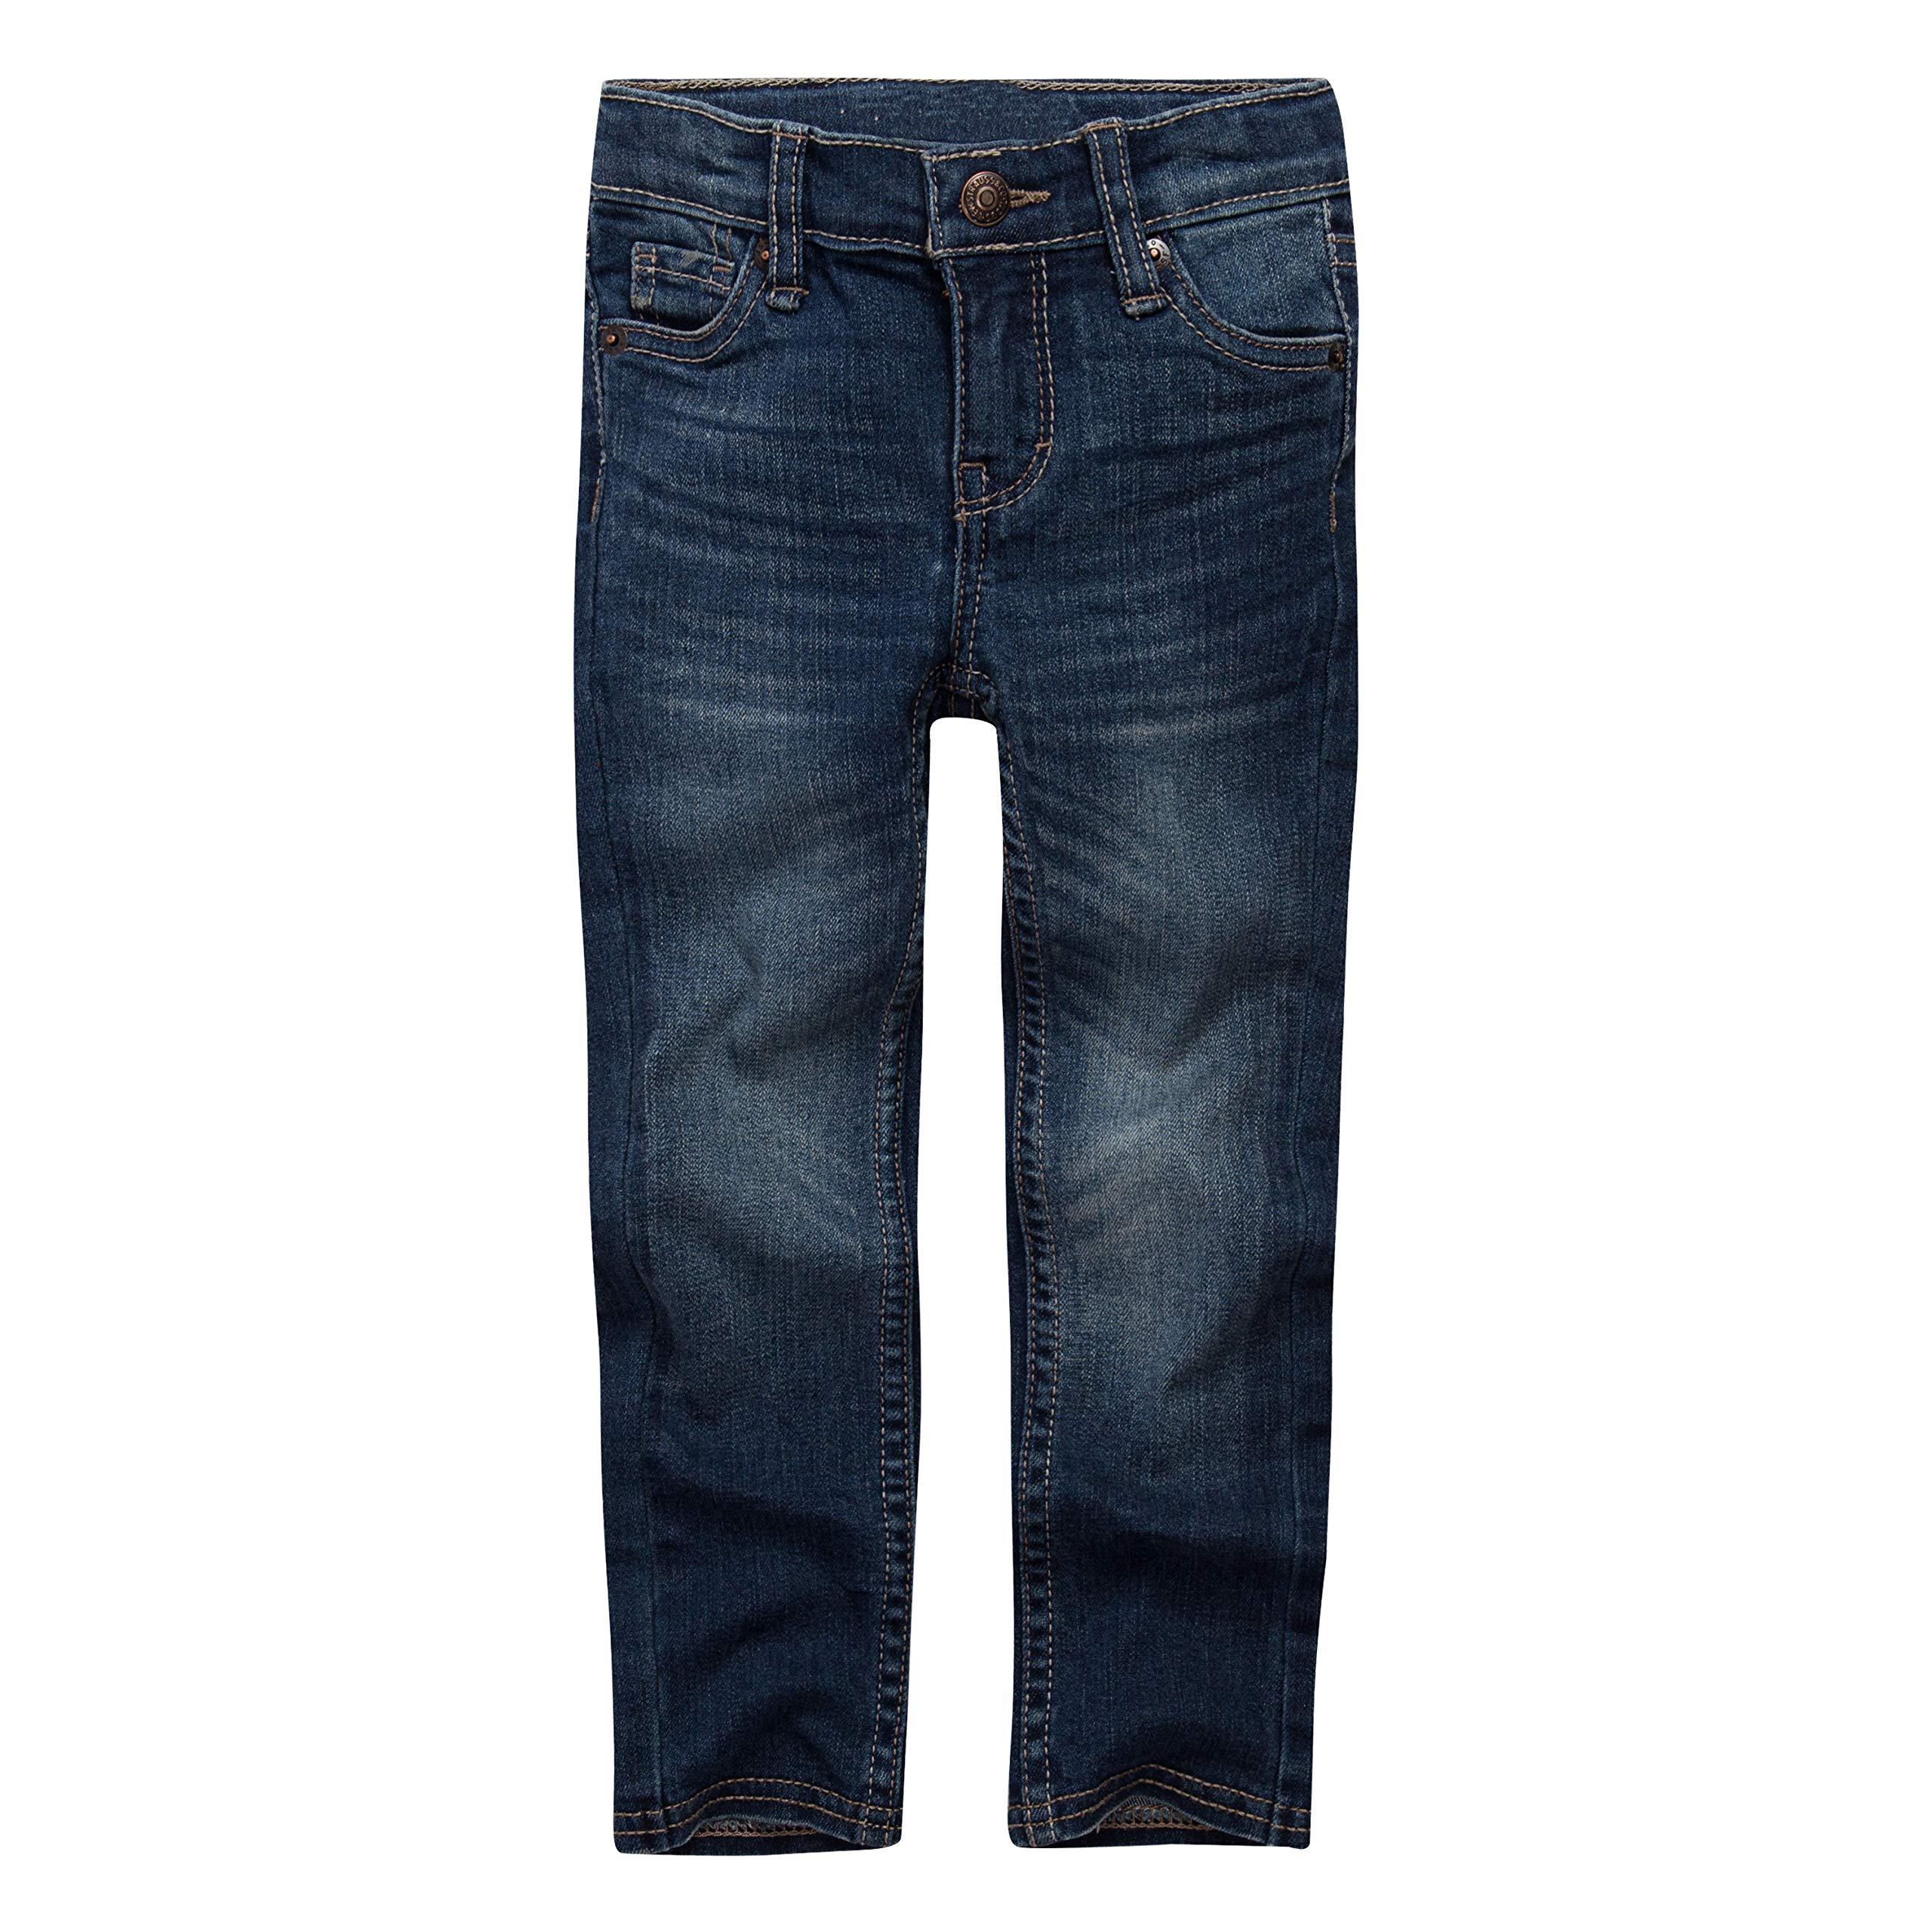 Levi's Girls' 711 Skinny Fit Jeans , Rockabilly, 8